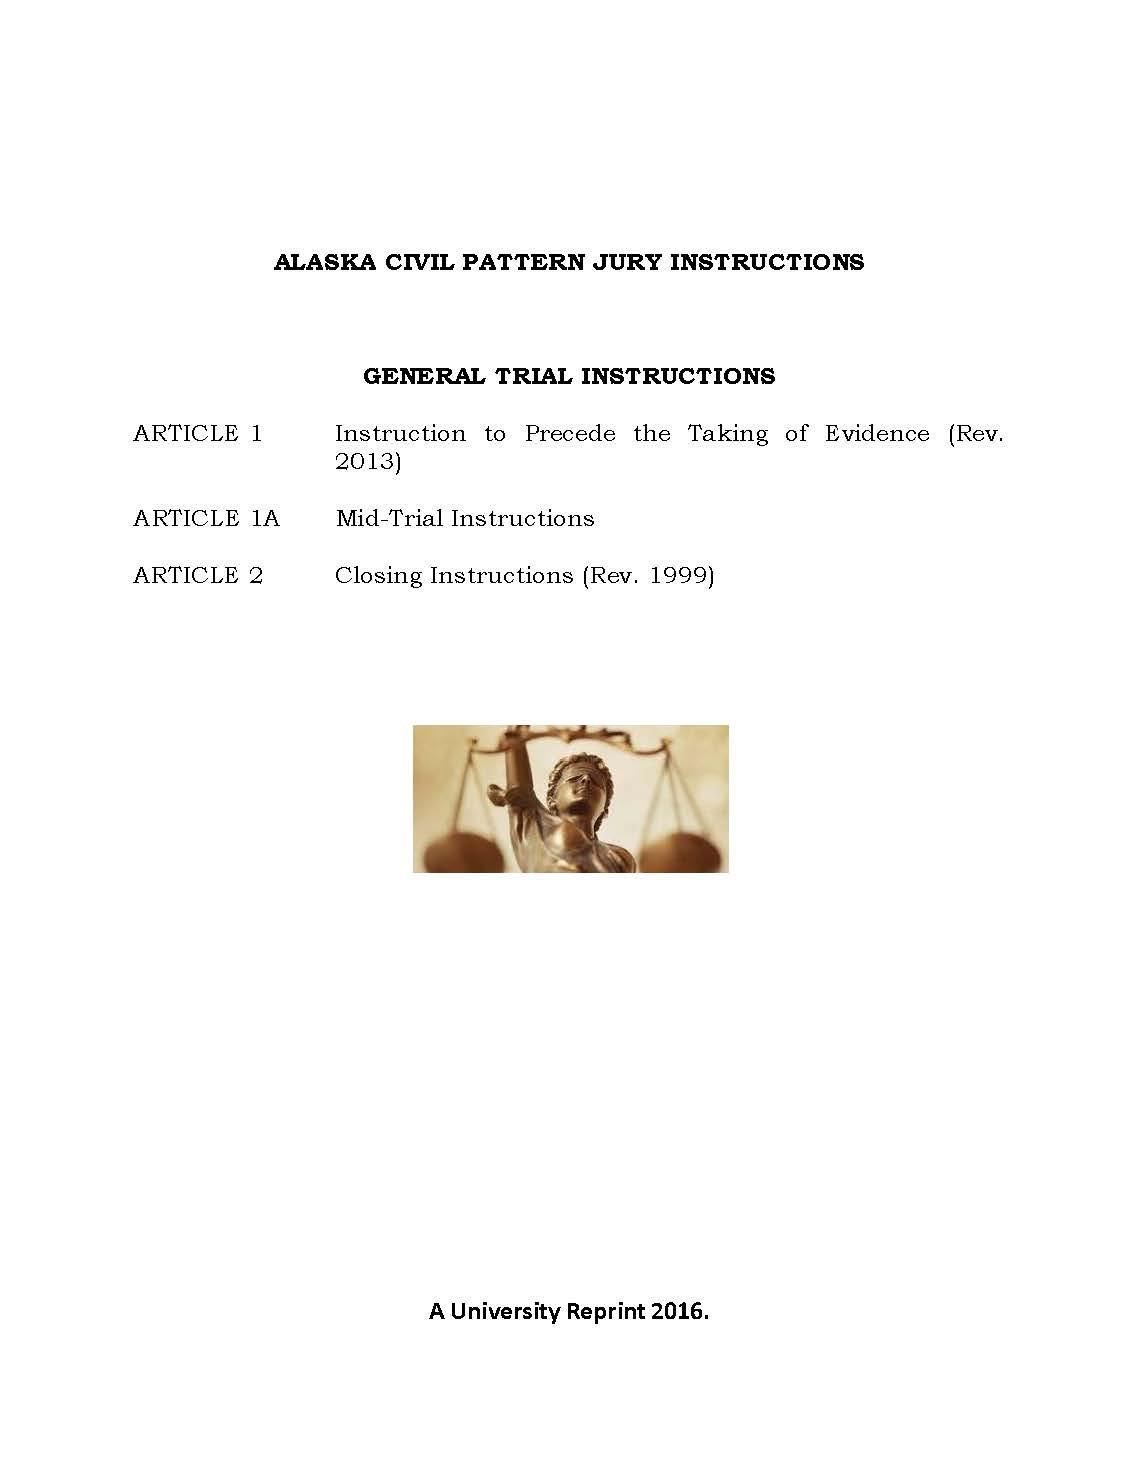 ALASKA CIVIL PATTERN JURY INSTRUCTIONS ARTICLES 1, 1A & 3 General Trial Instructions (Preceding Evidence-Taking, Mid-Trial, Closing) [Loose Leaf] PDF ePub ebook